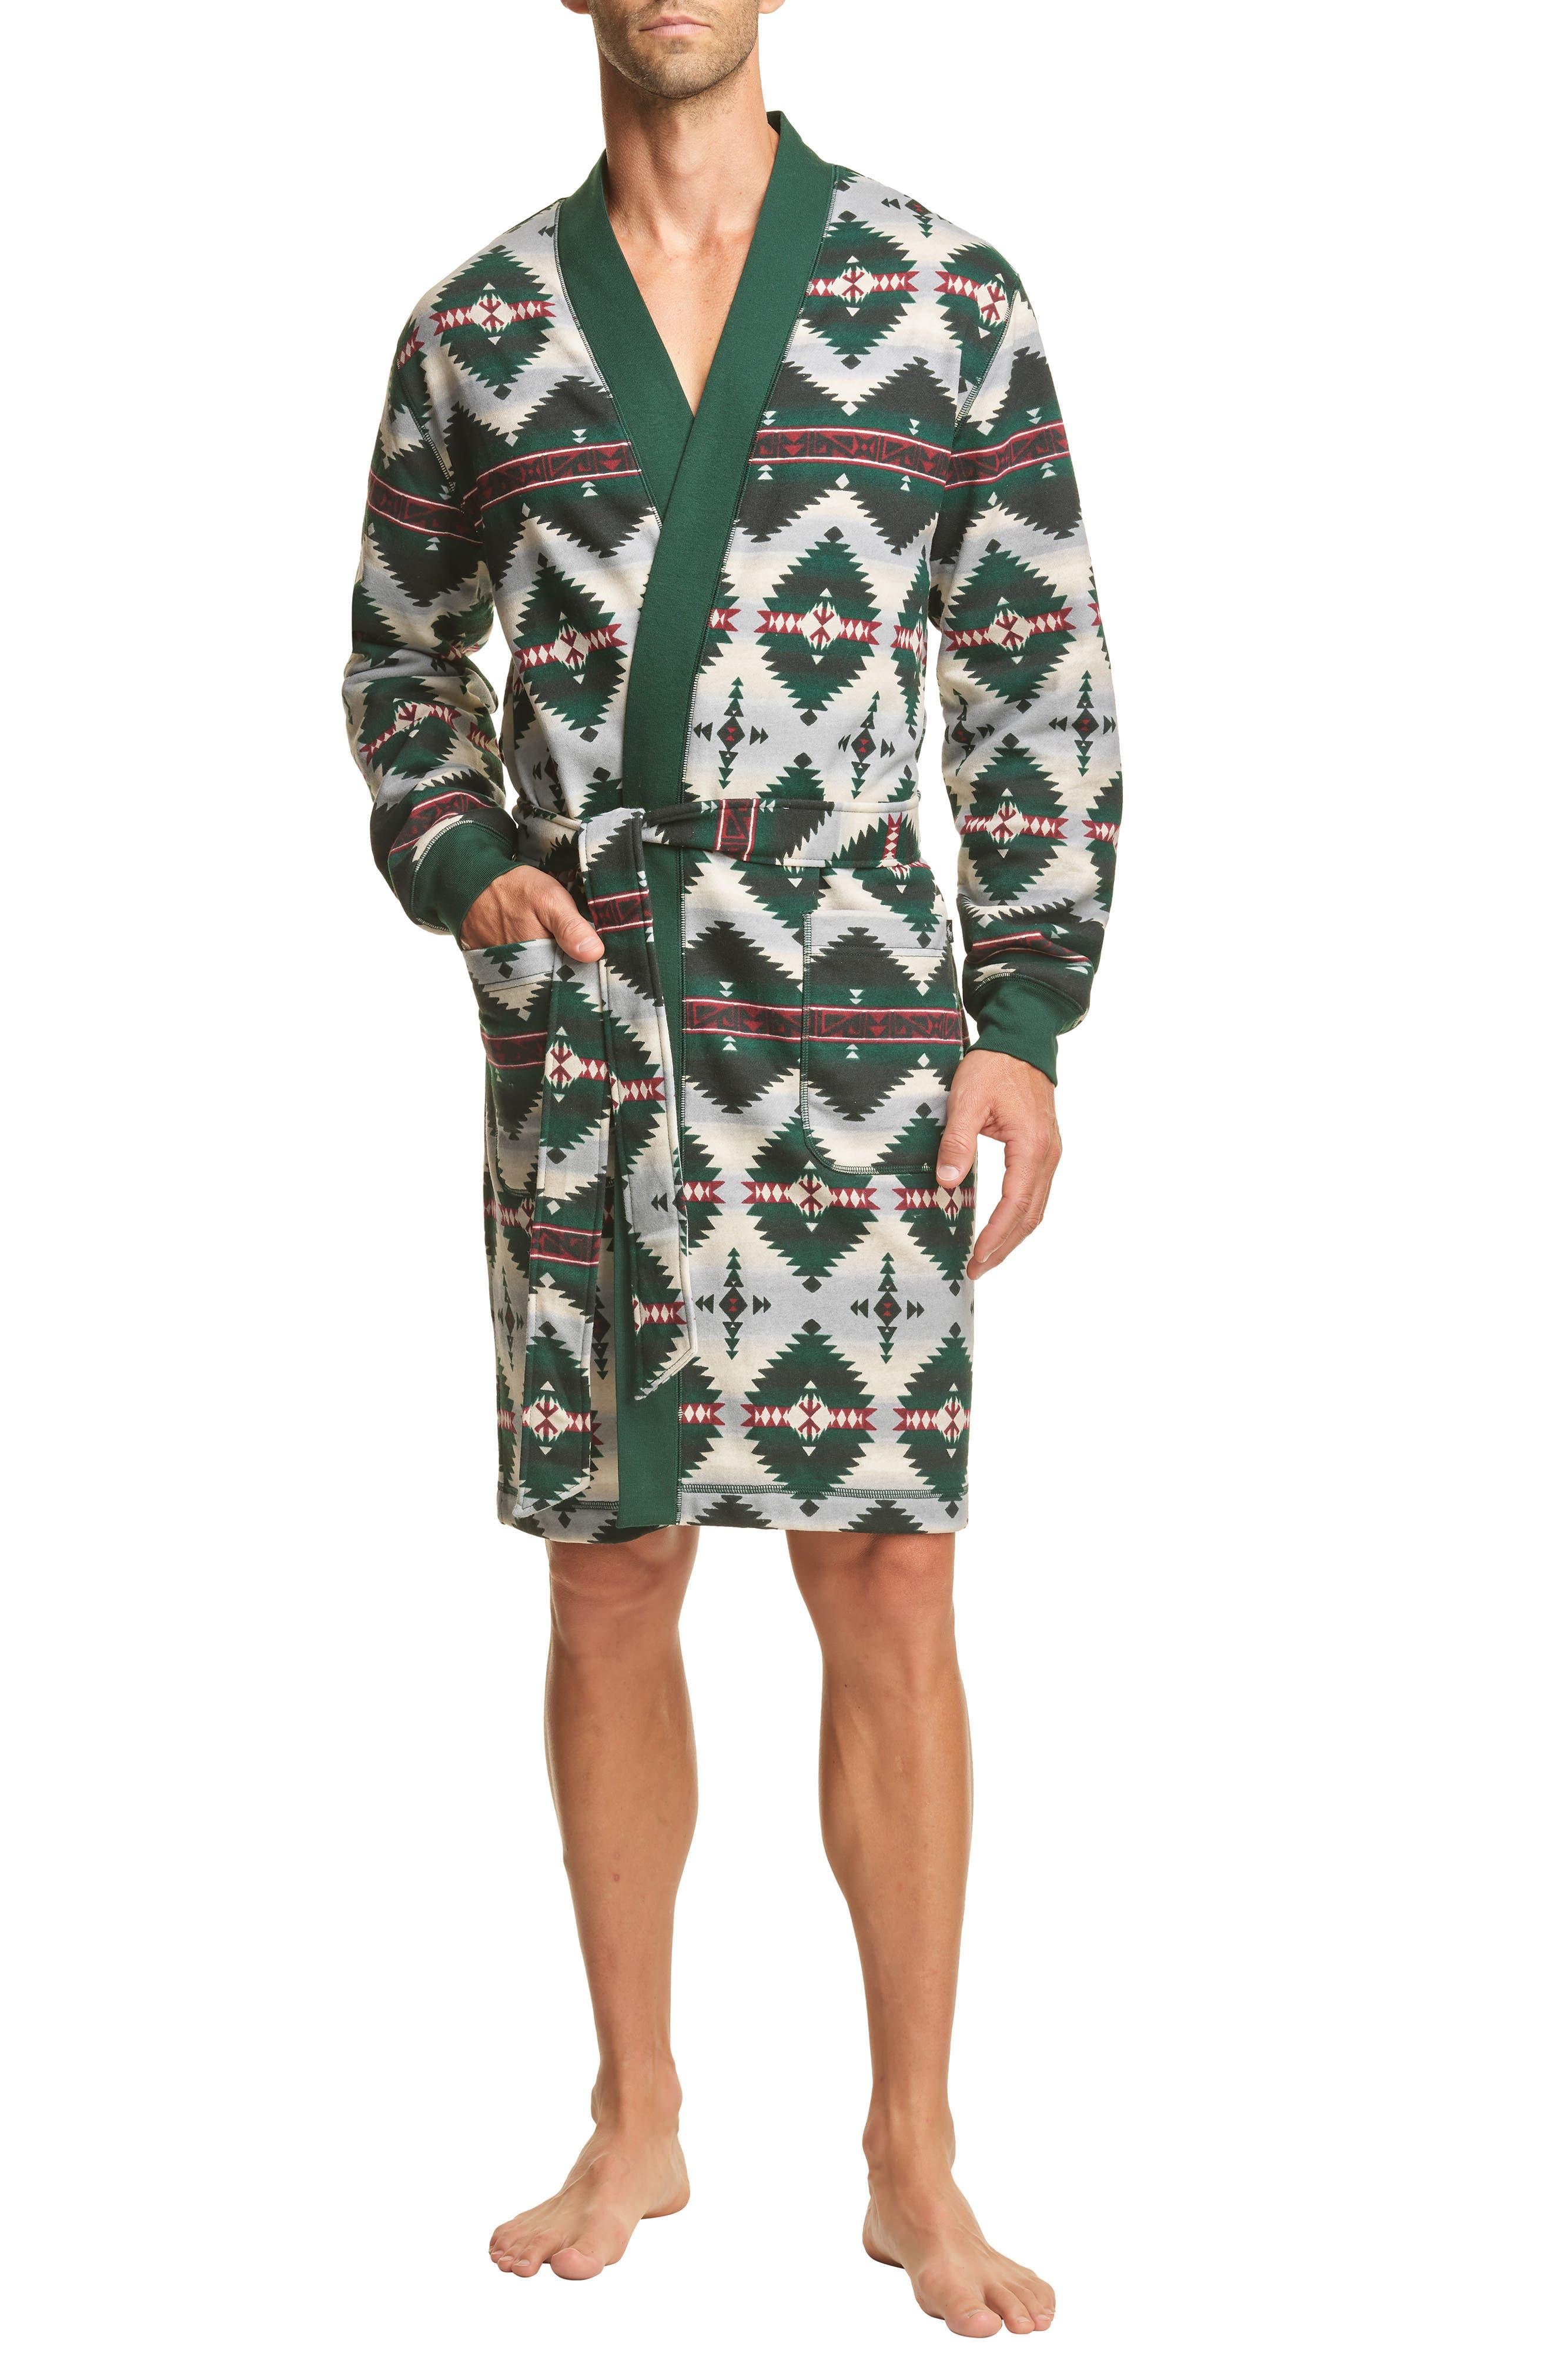 1930s Men's Clothing Mens Polo Ralph Lauren Brushed Fleece Robe Size SmallMedium - Green $79.50 AT vintagedancer.com